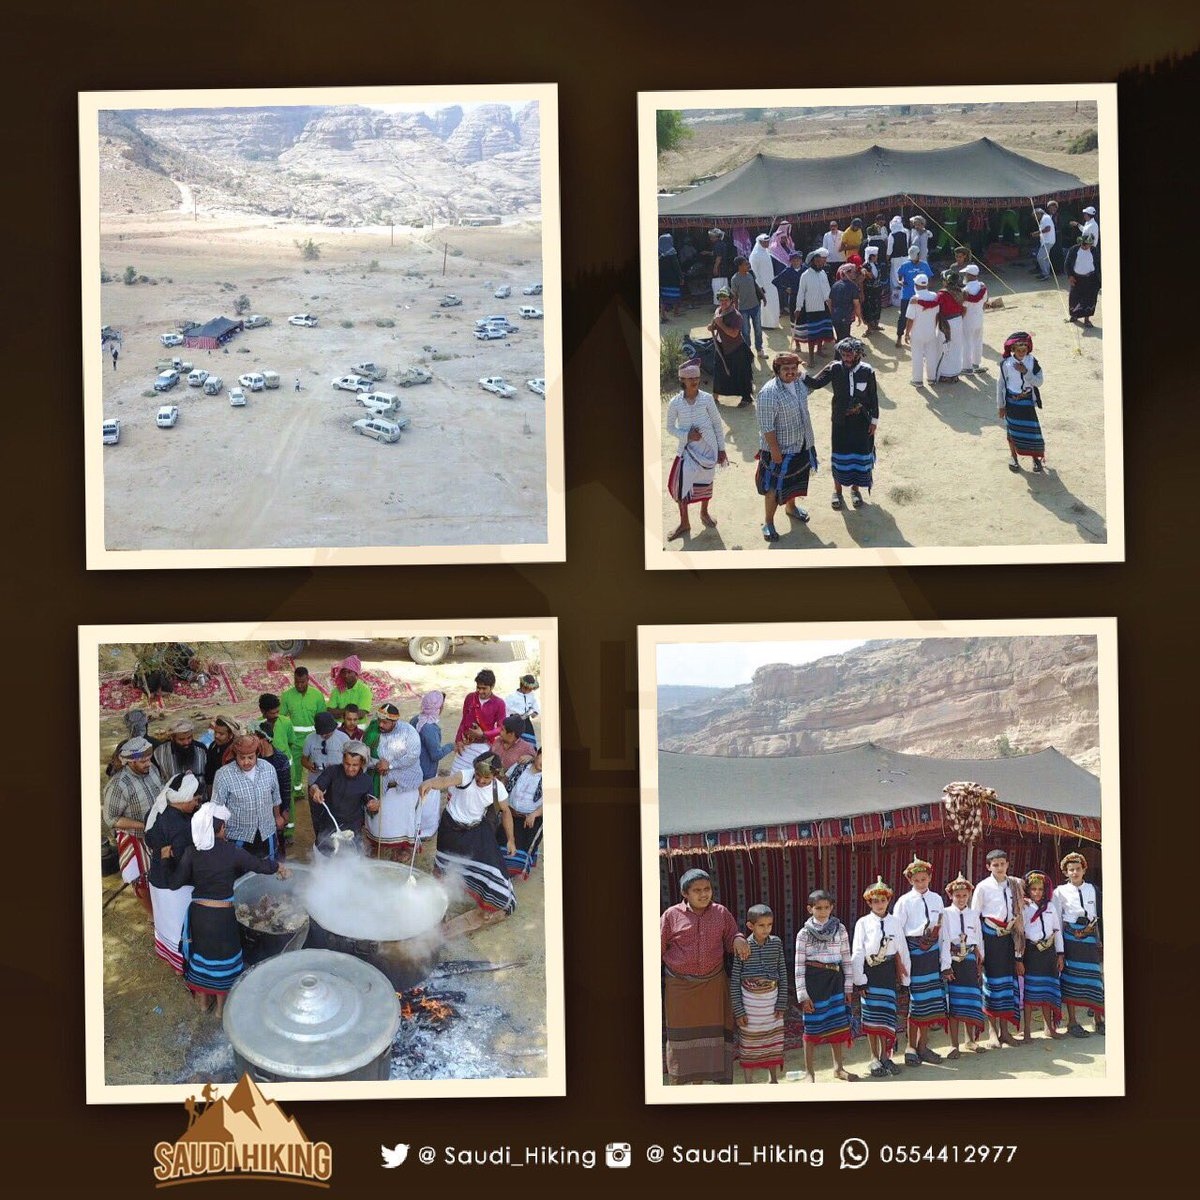 7df072f29 الشباب المشاركين في #هايكنج #محافظة_الريث #هايكنج_السعوديةpic.twitter .com/kujvSjyAZt